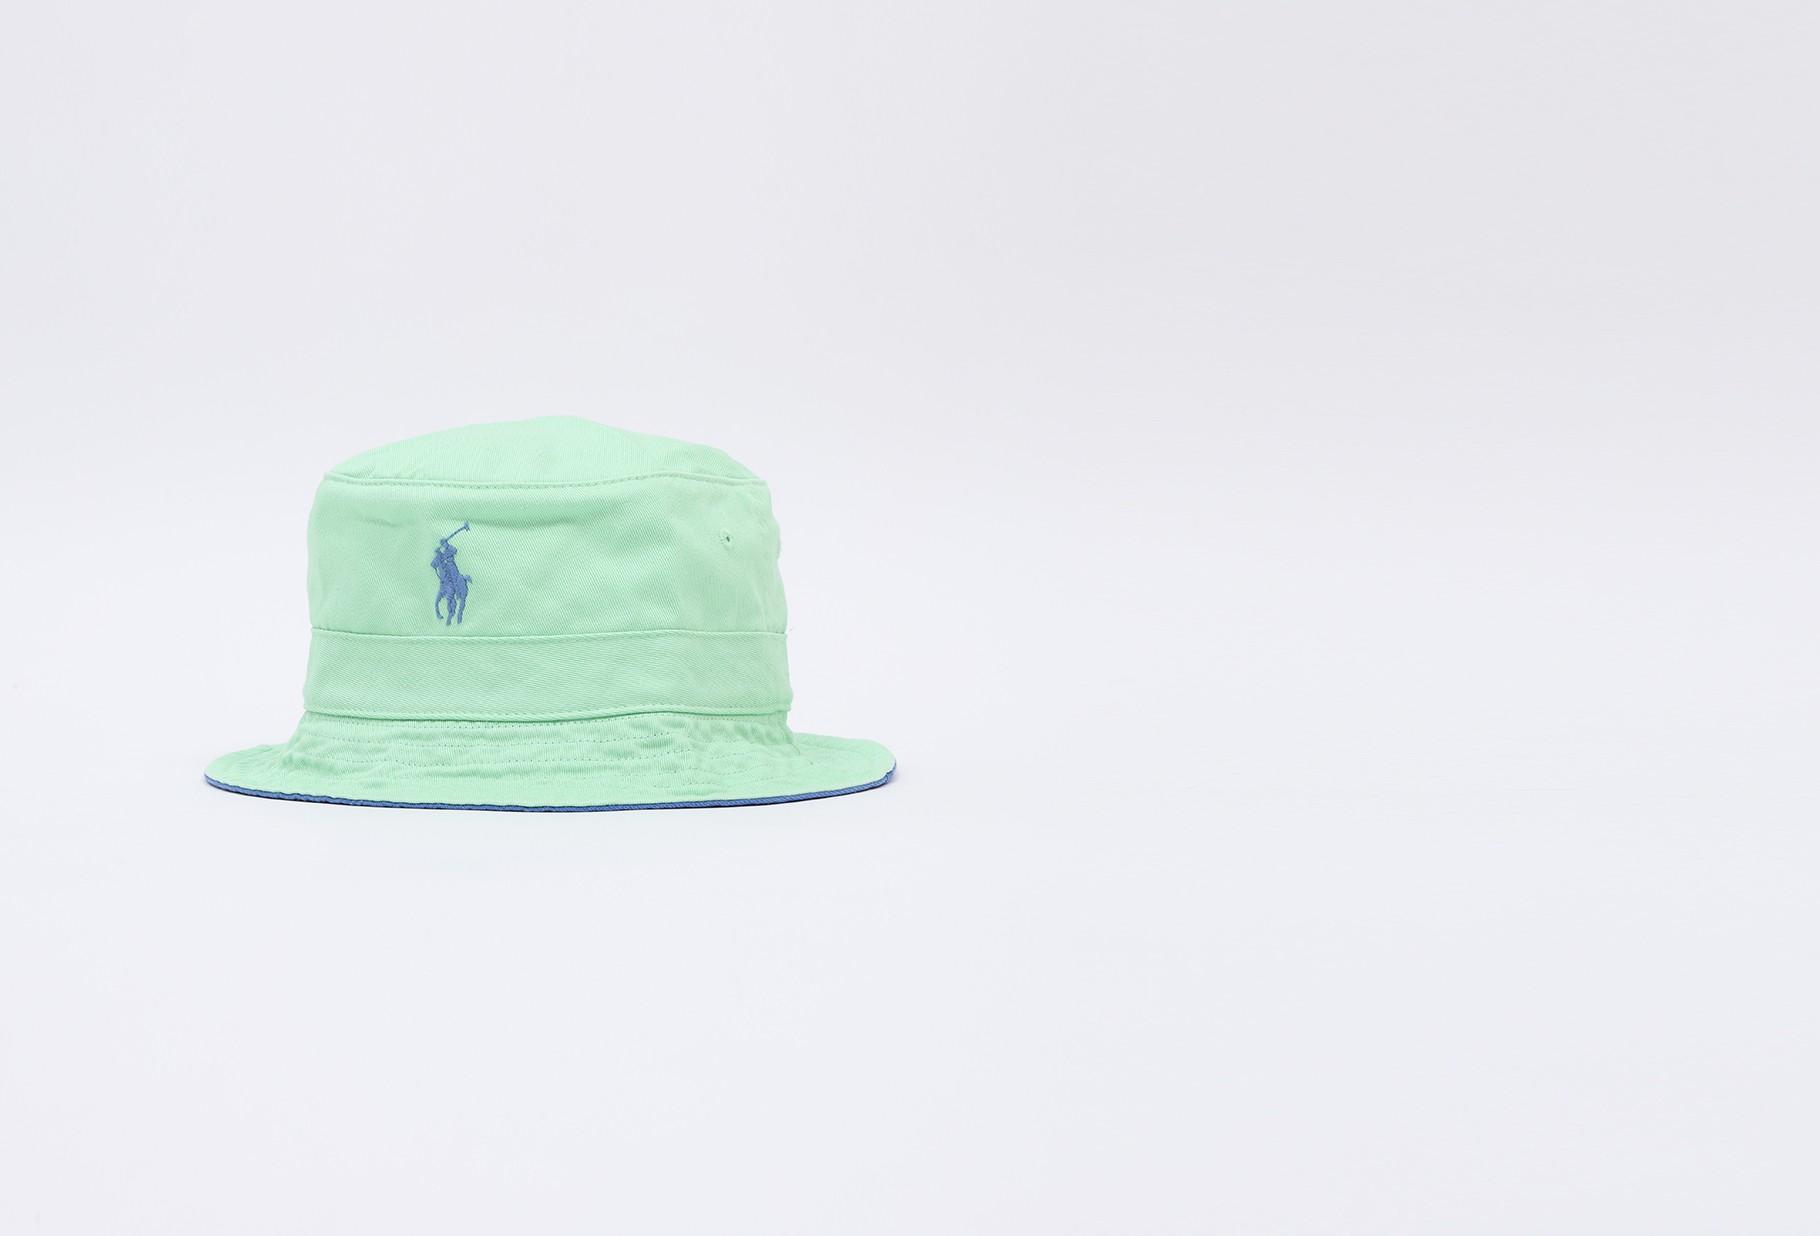 POLO RALPH LAUREN / Loft bucket hat cotton chino Green